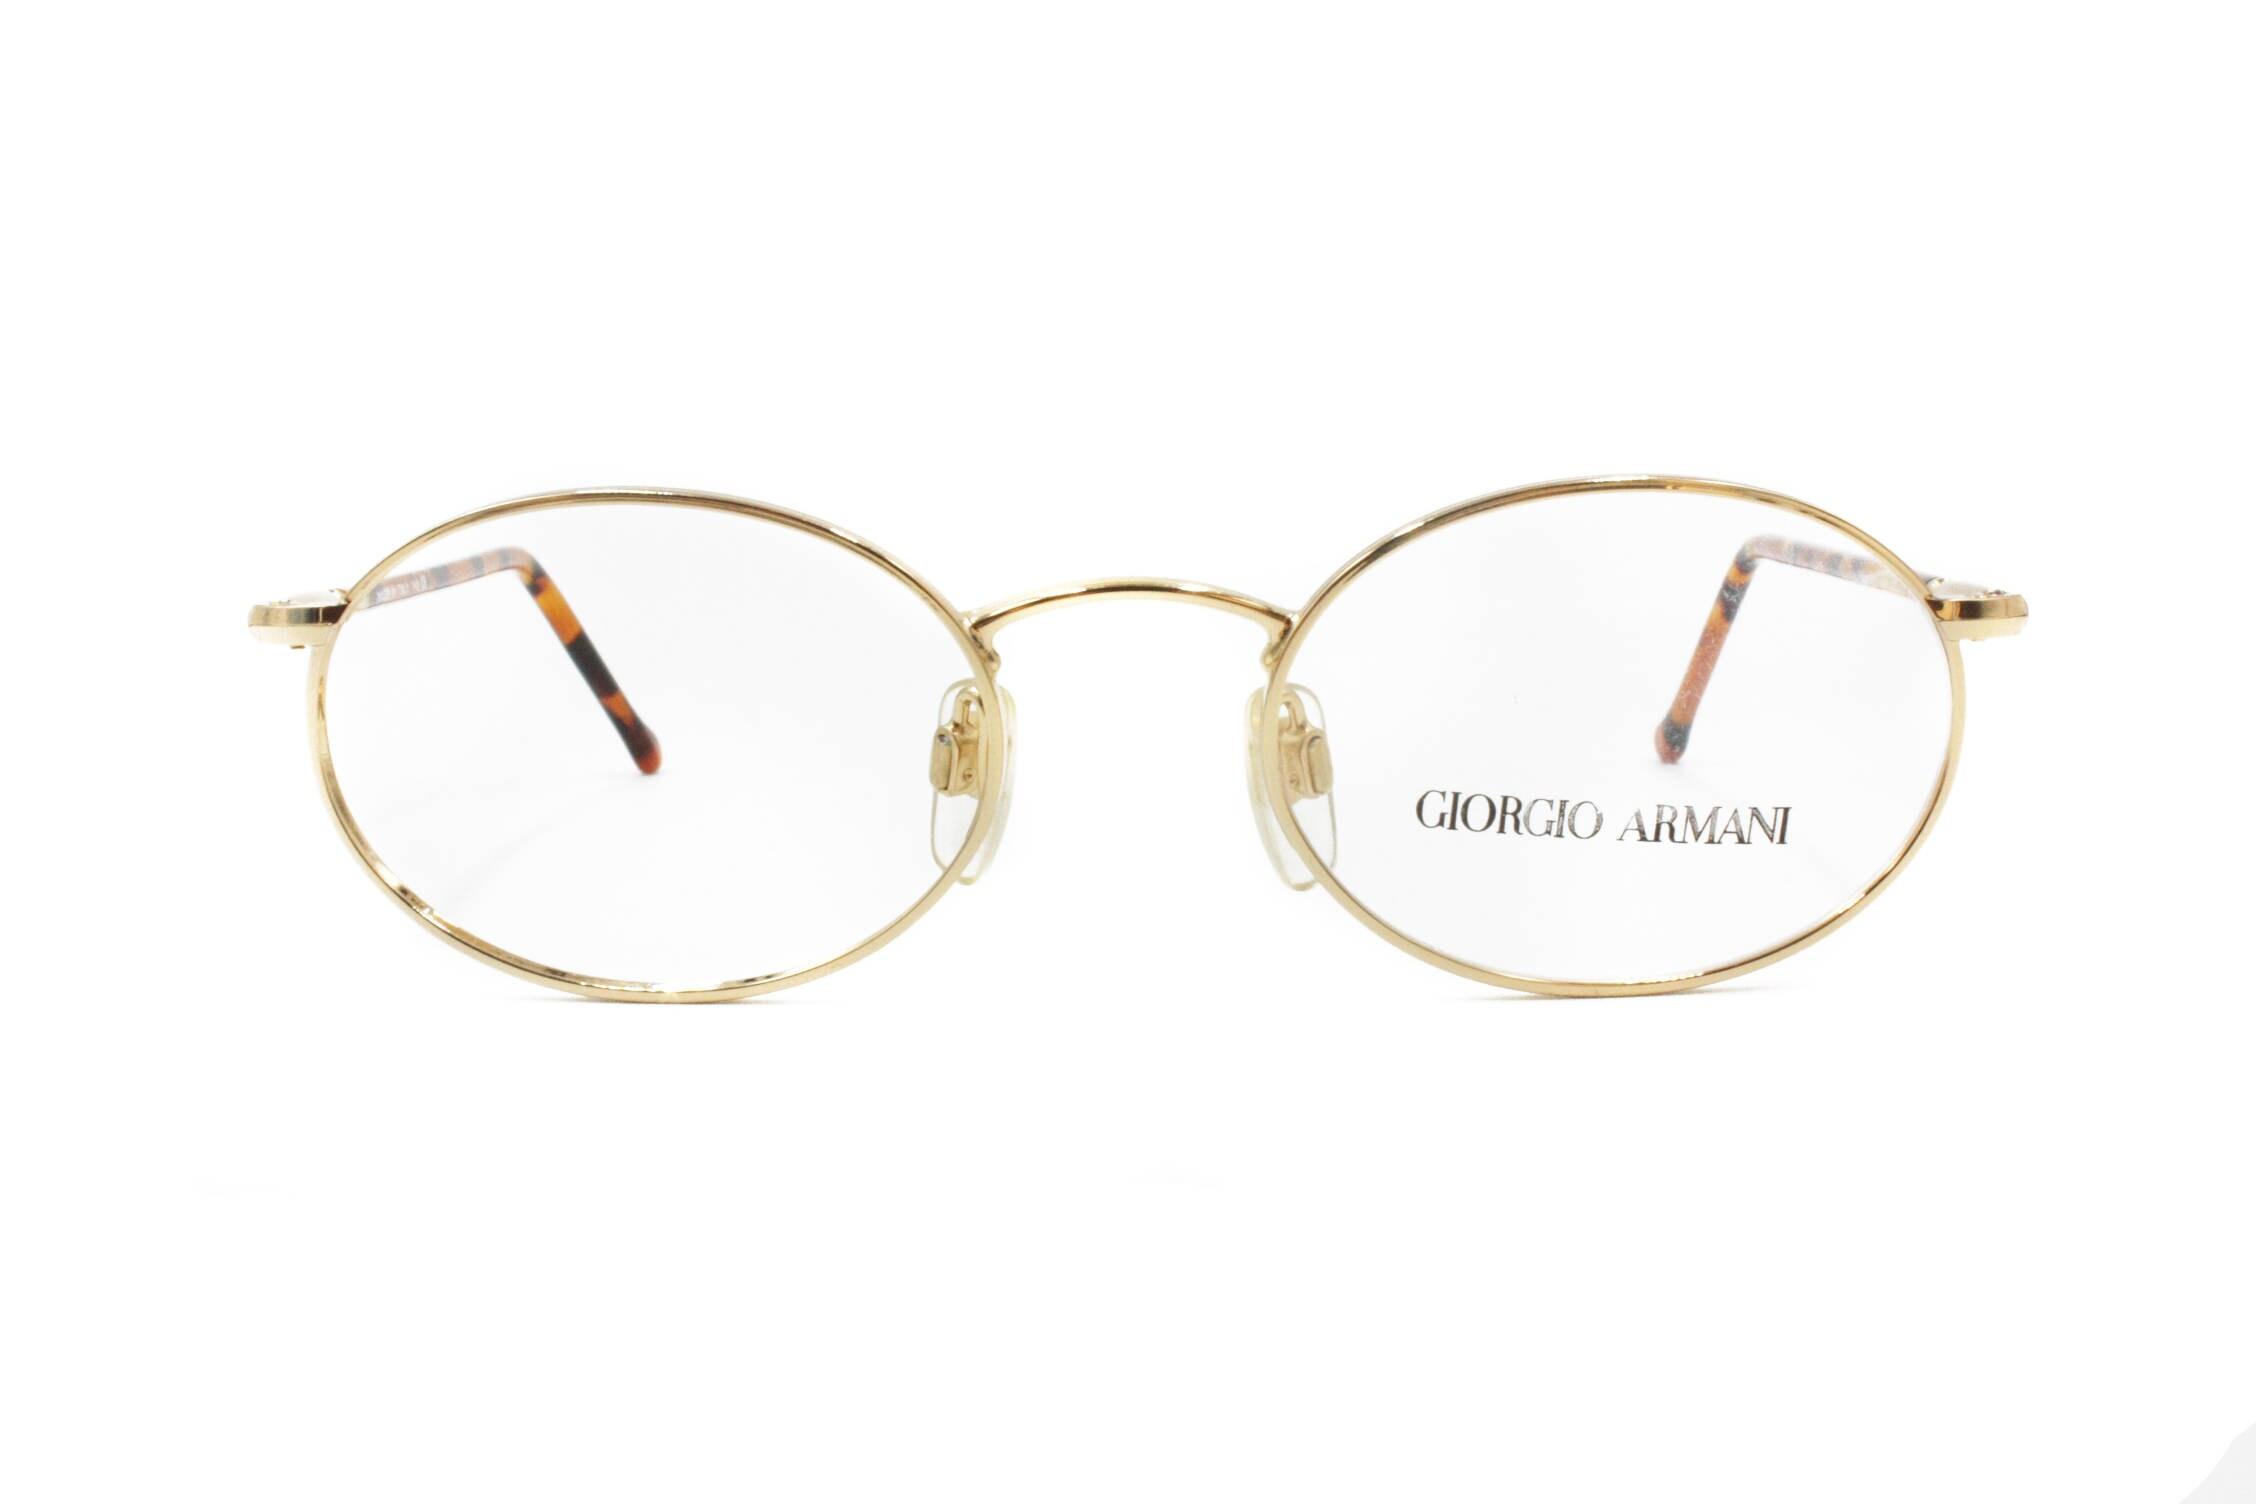 Giorgio Armani Brillen ovalen Rahmen / / blass goldene Metall | Etsy